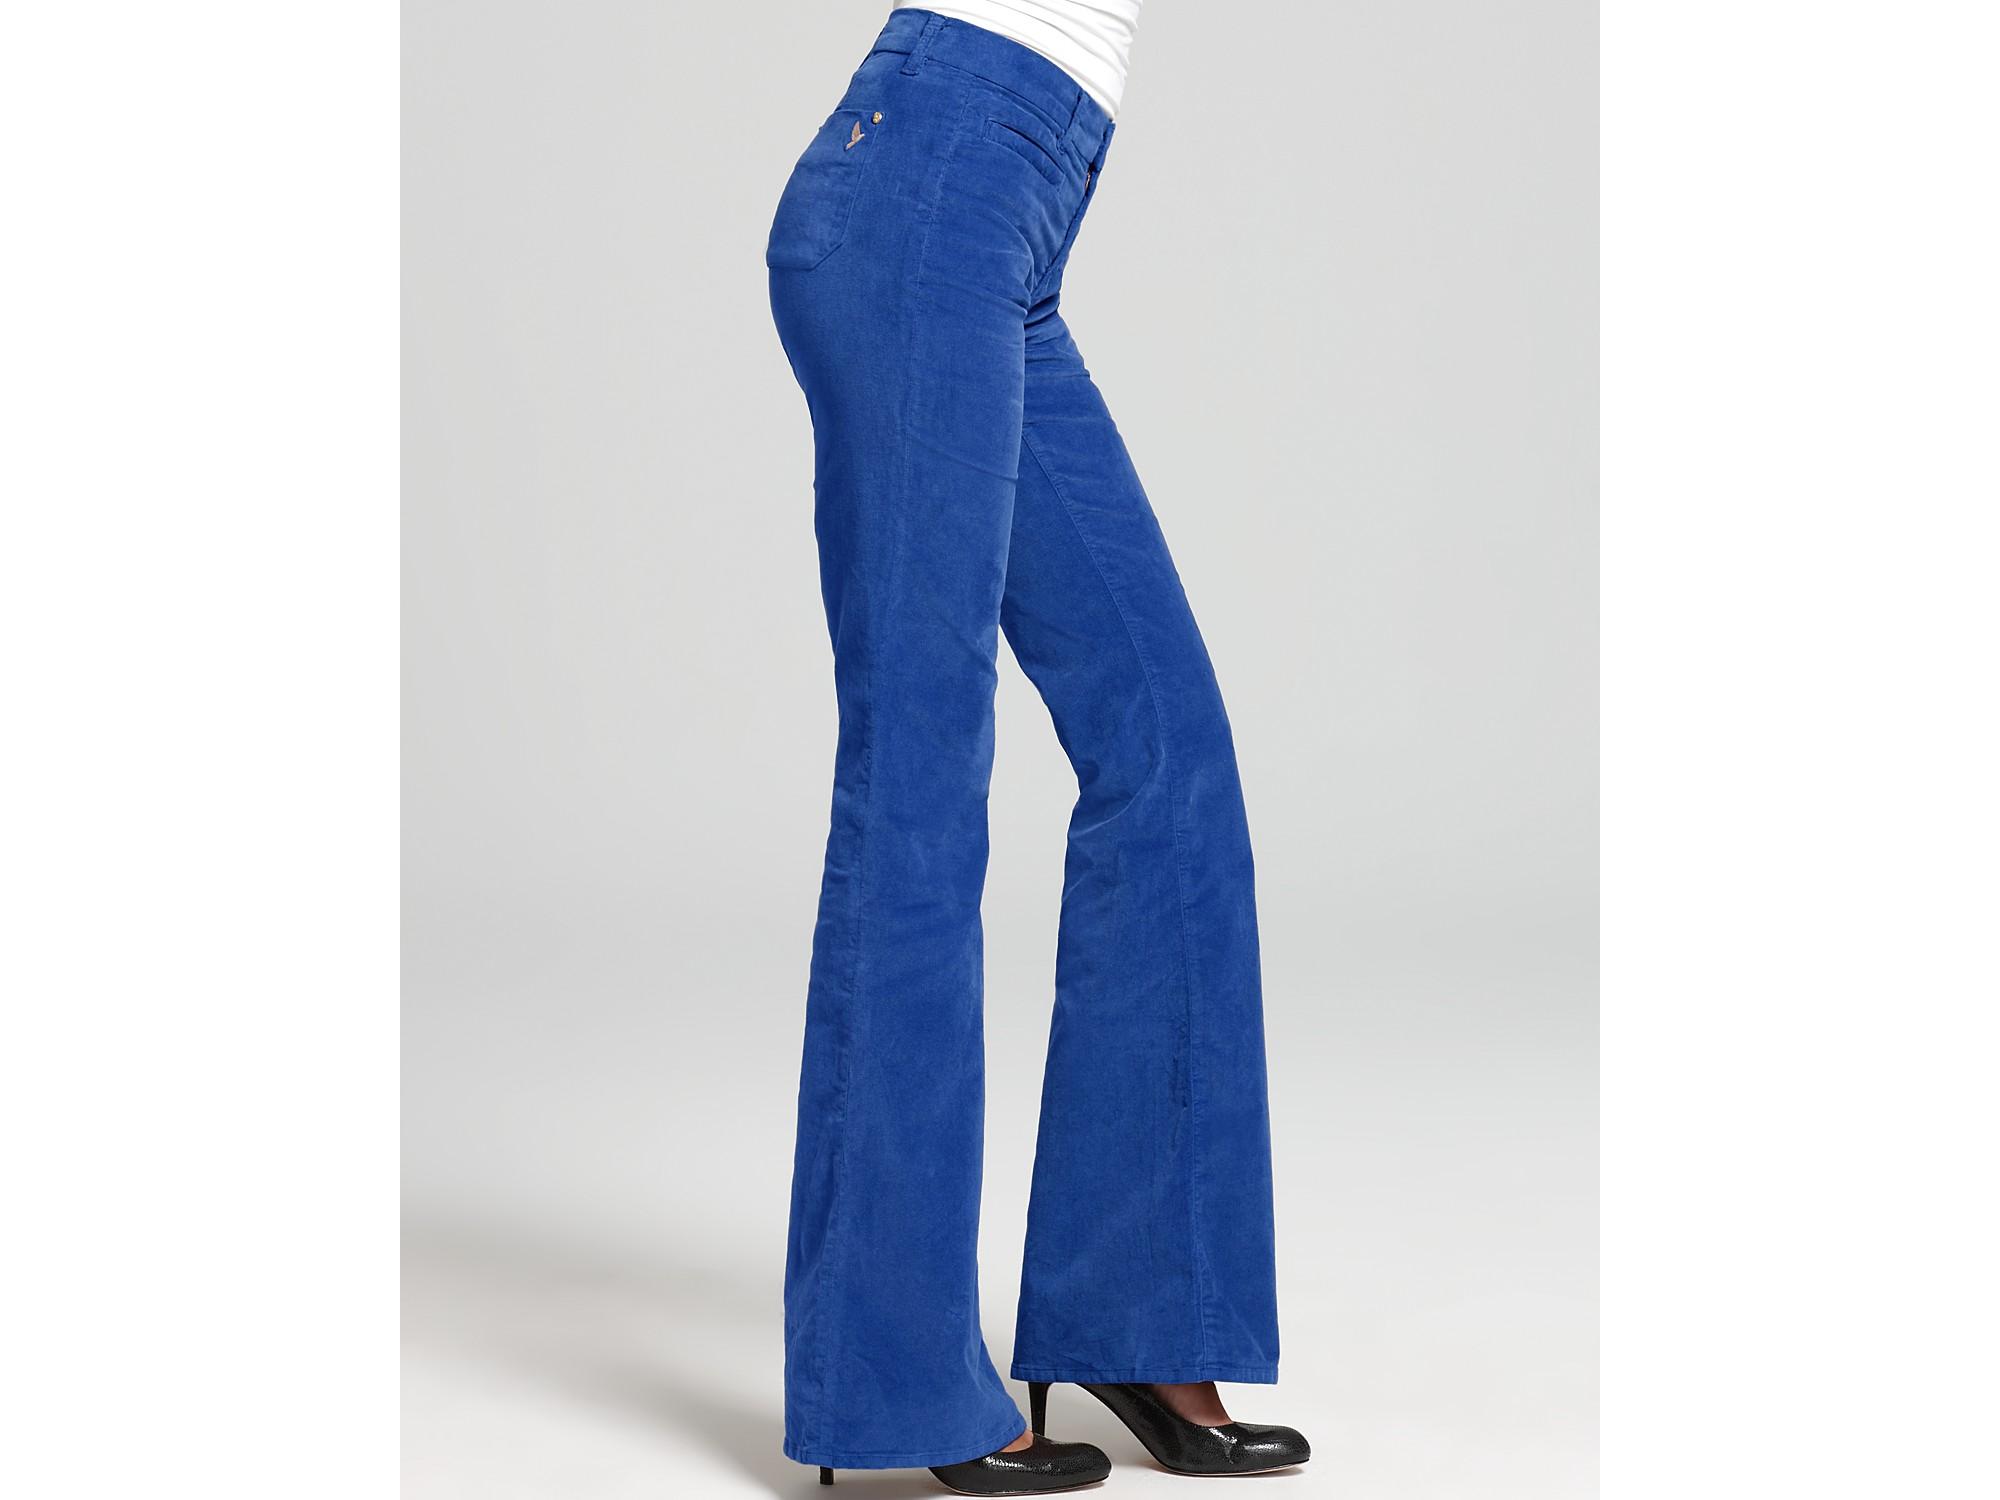 M.i.h jeans Pants Marrakesh Colored Velvet Flare Pants in Blue | Lyst